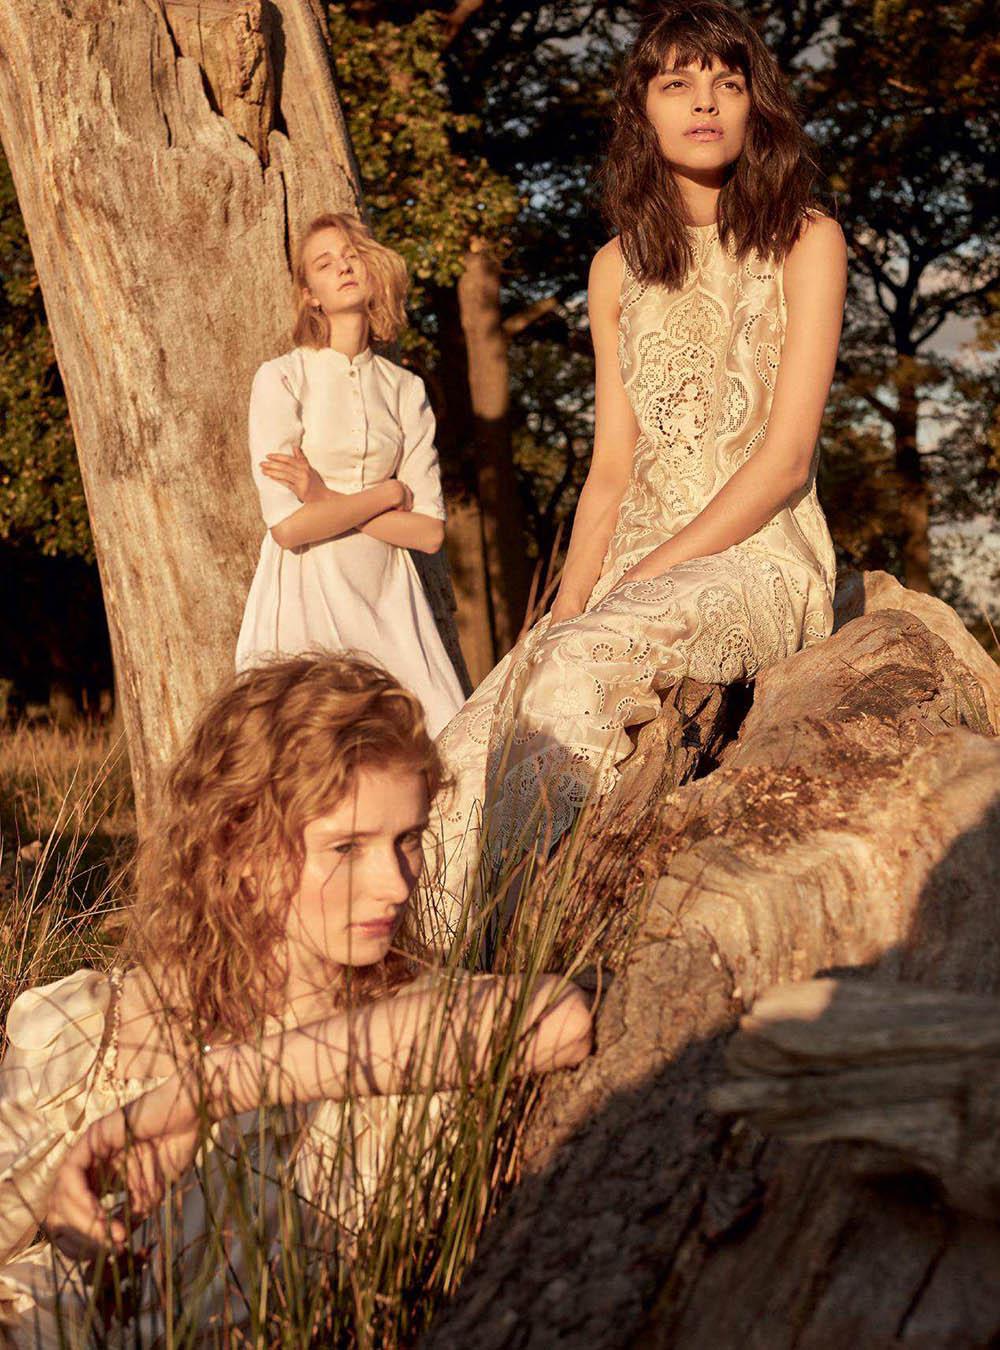 Harper's Bazaar UK May 2018 cover by Agata Pospieszynska